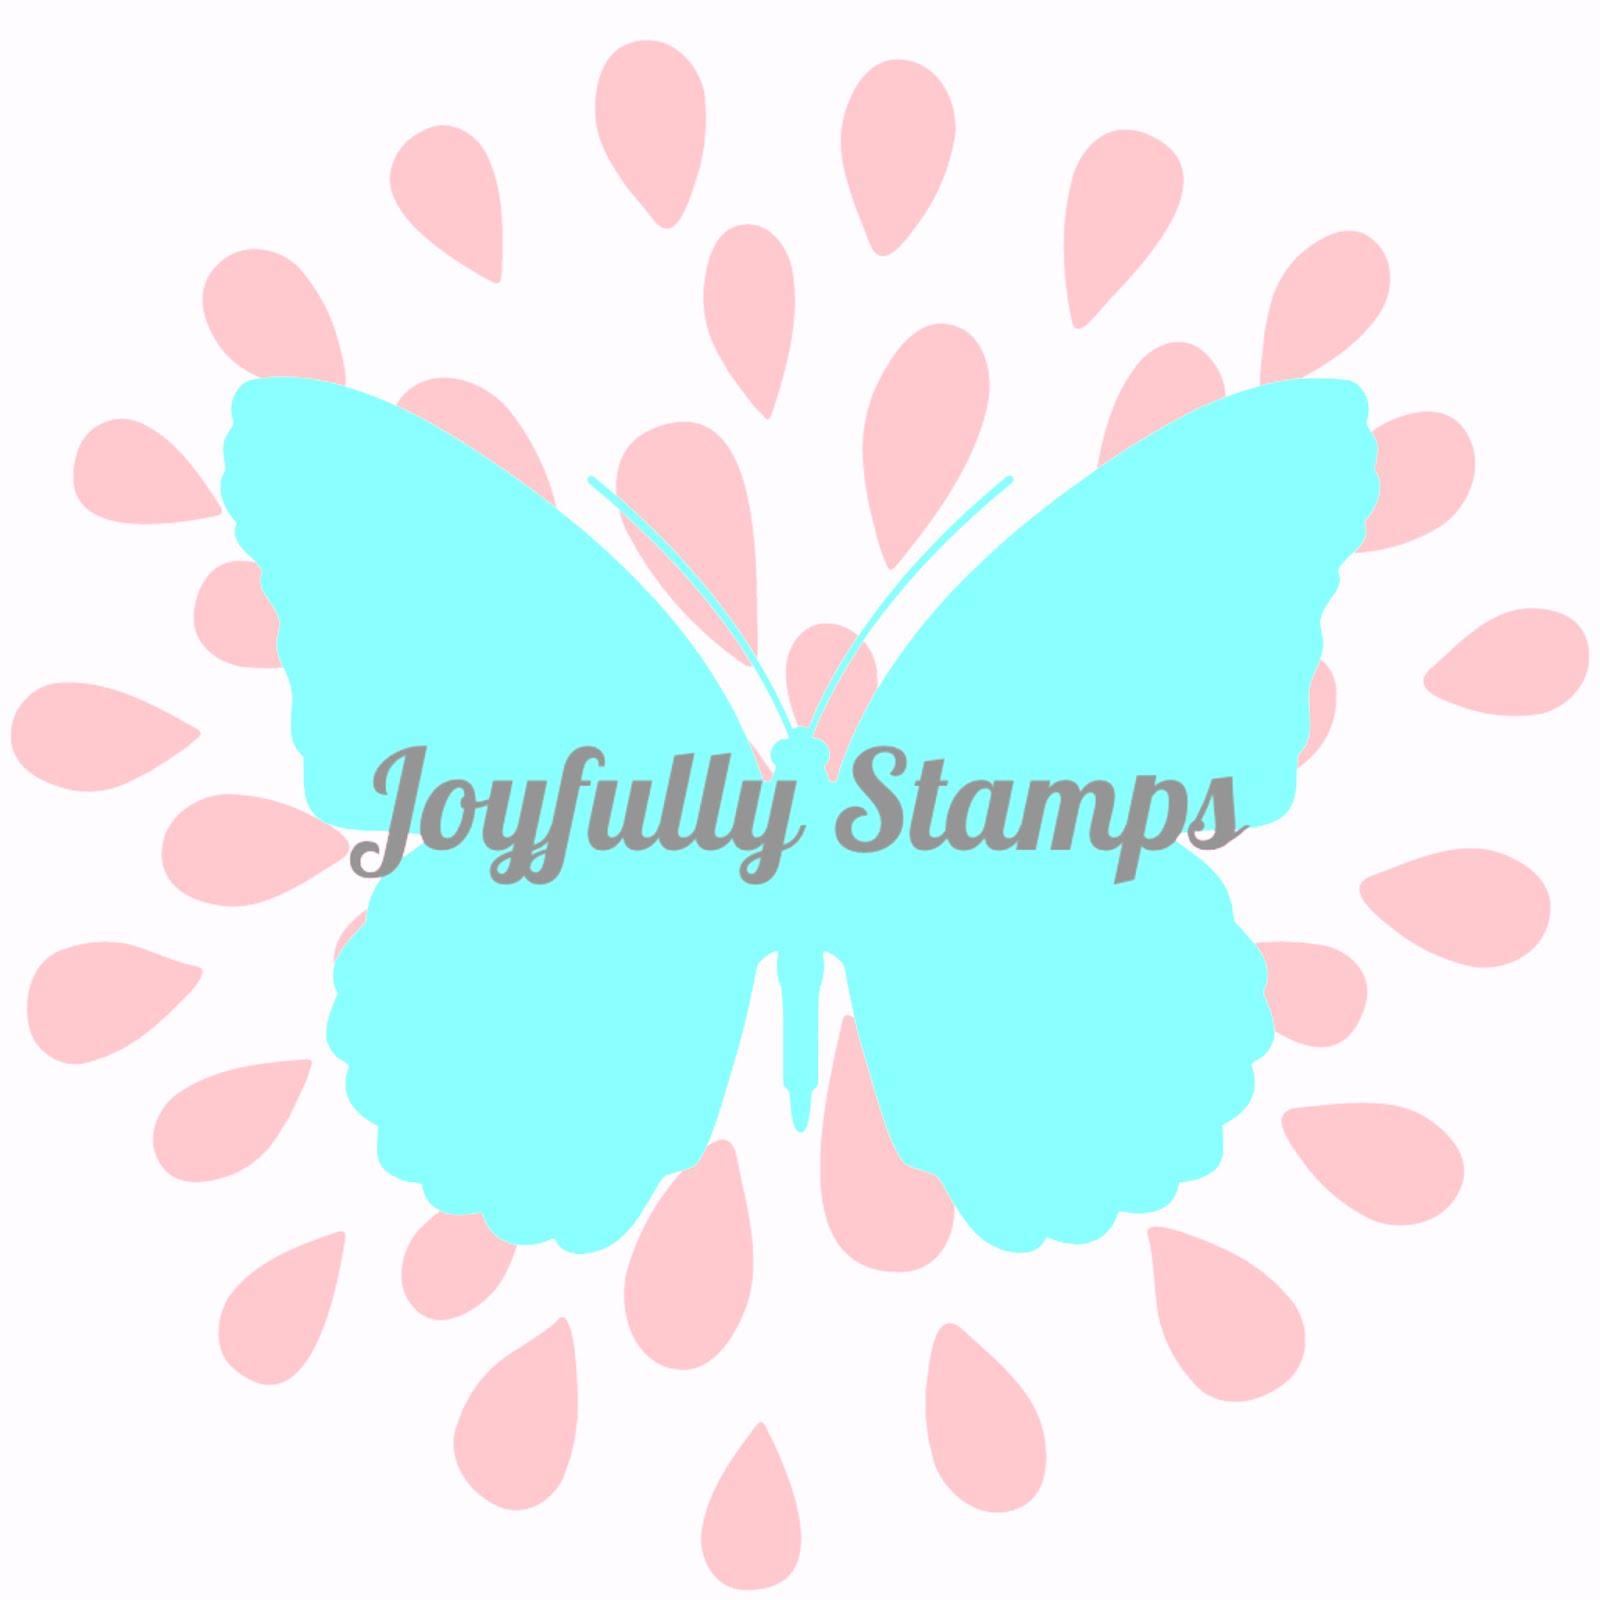 Joyfullystamps Shop